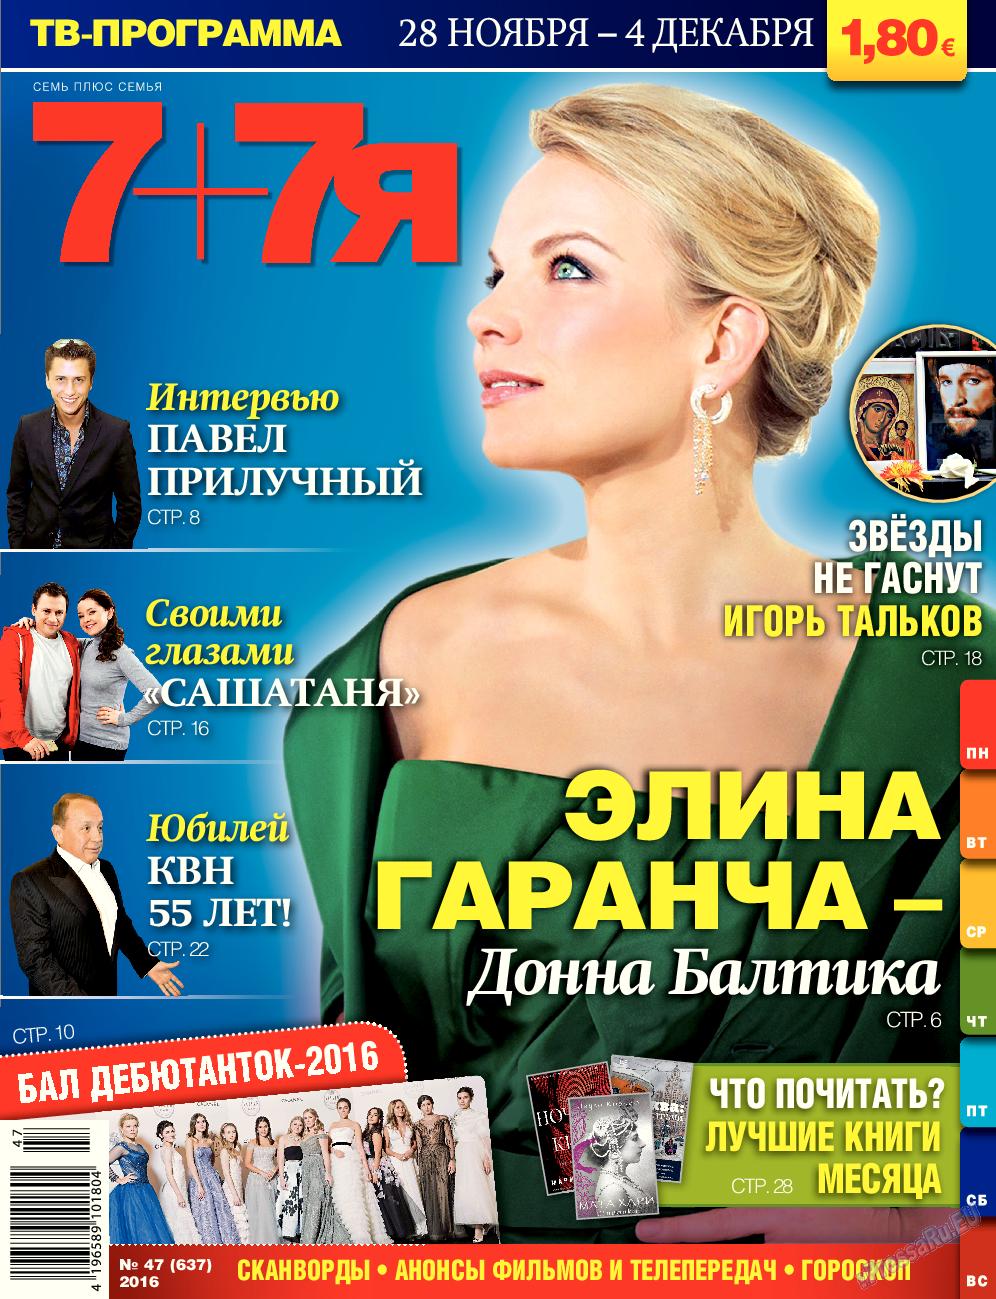 7плюс7я (журнал). 2016 год, номер 47, стр. 1